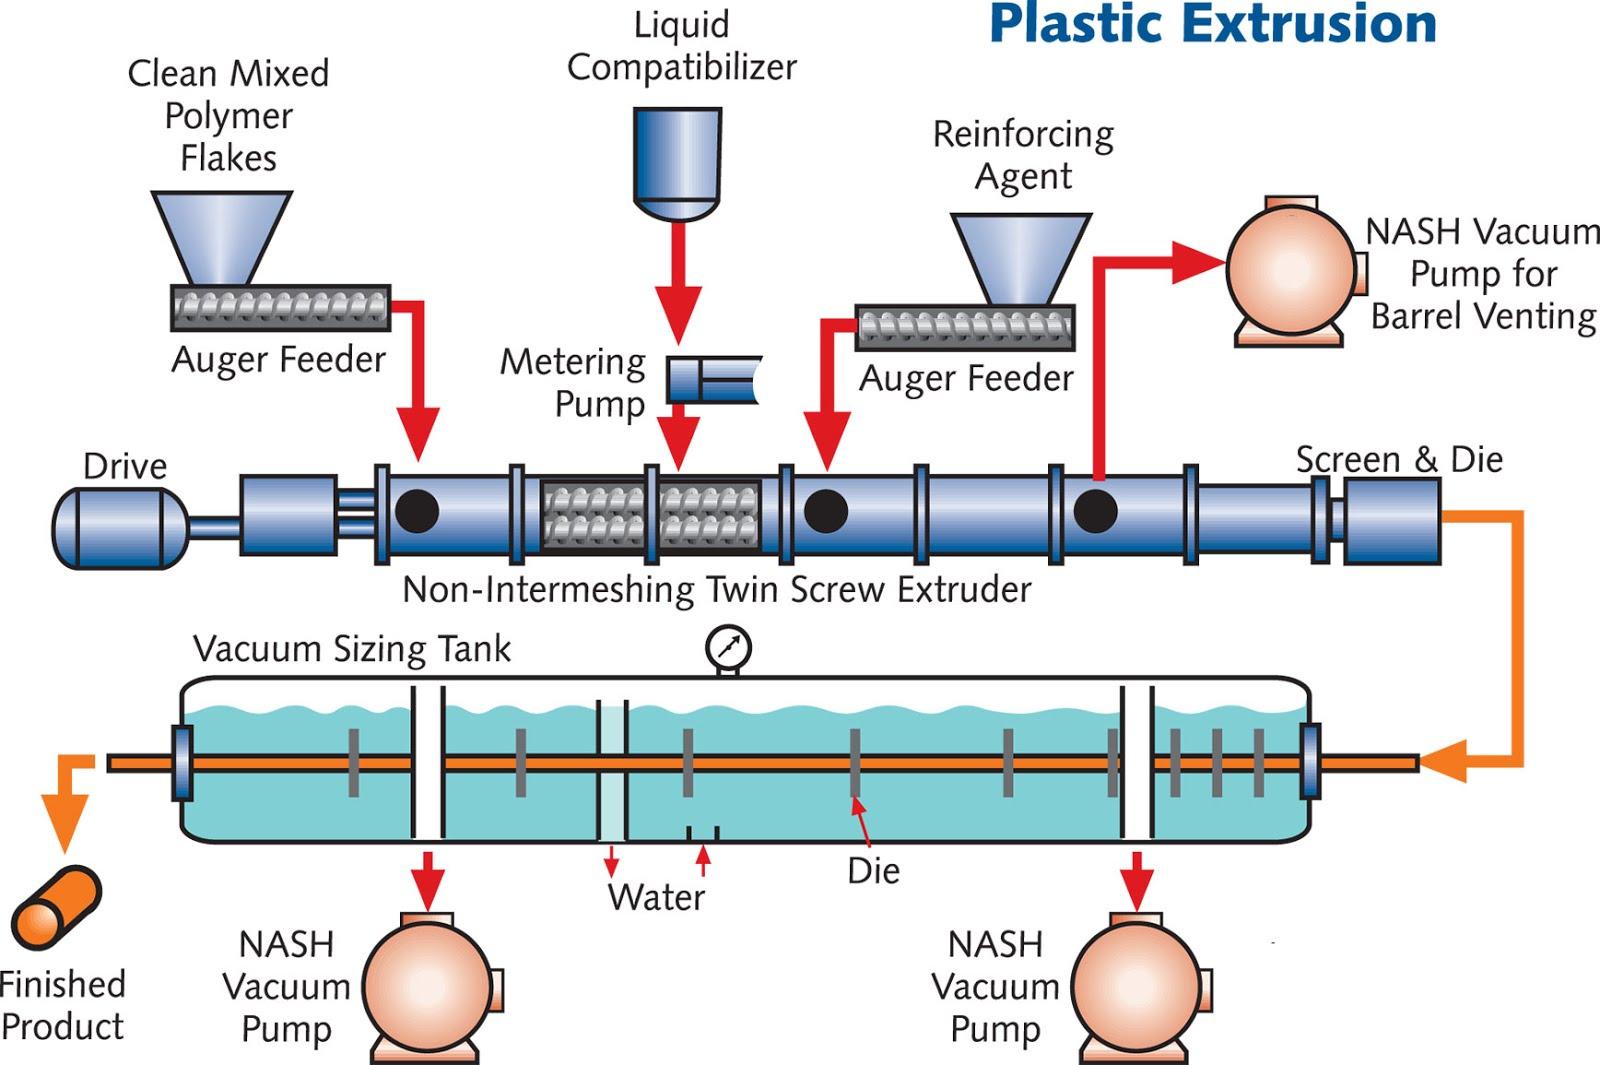 Plastic Extrusion - MechanicsTips